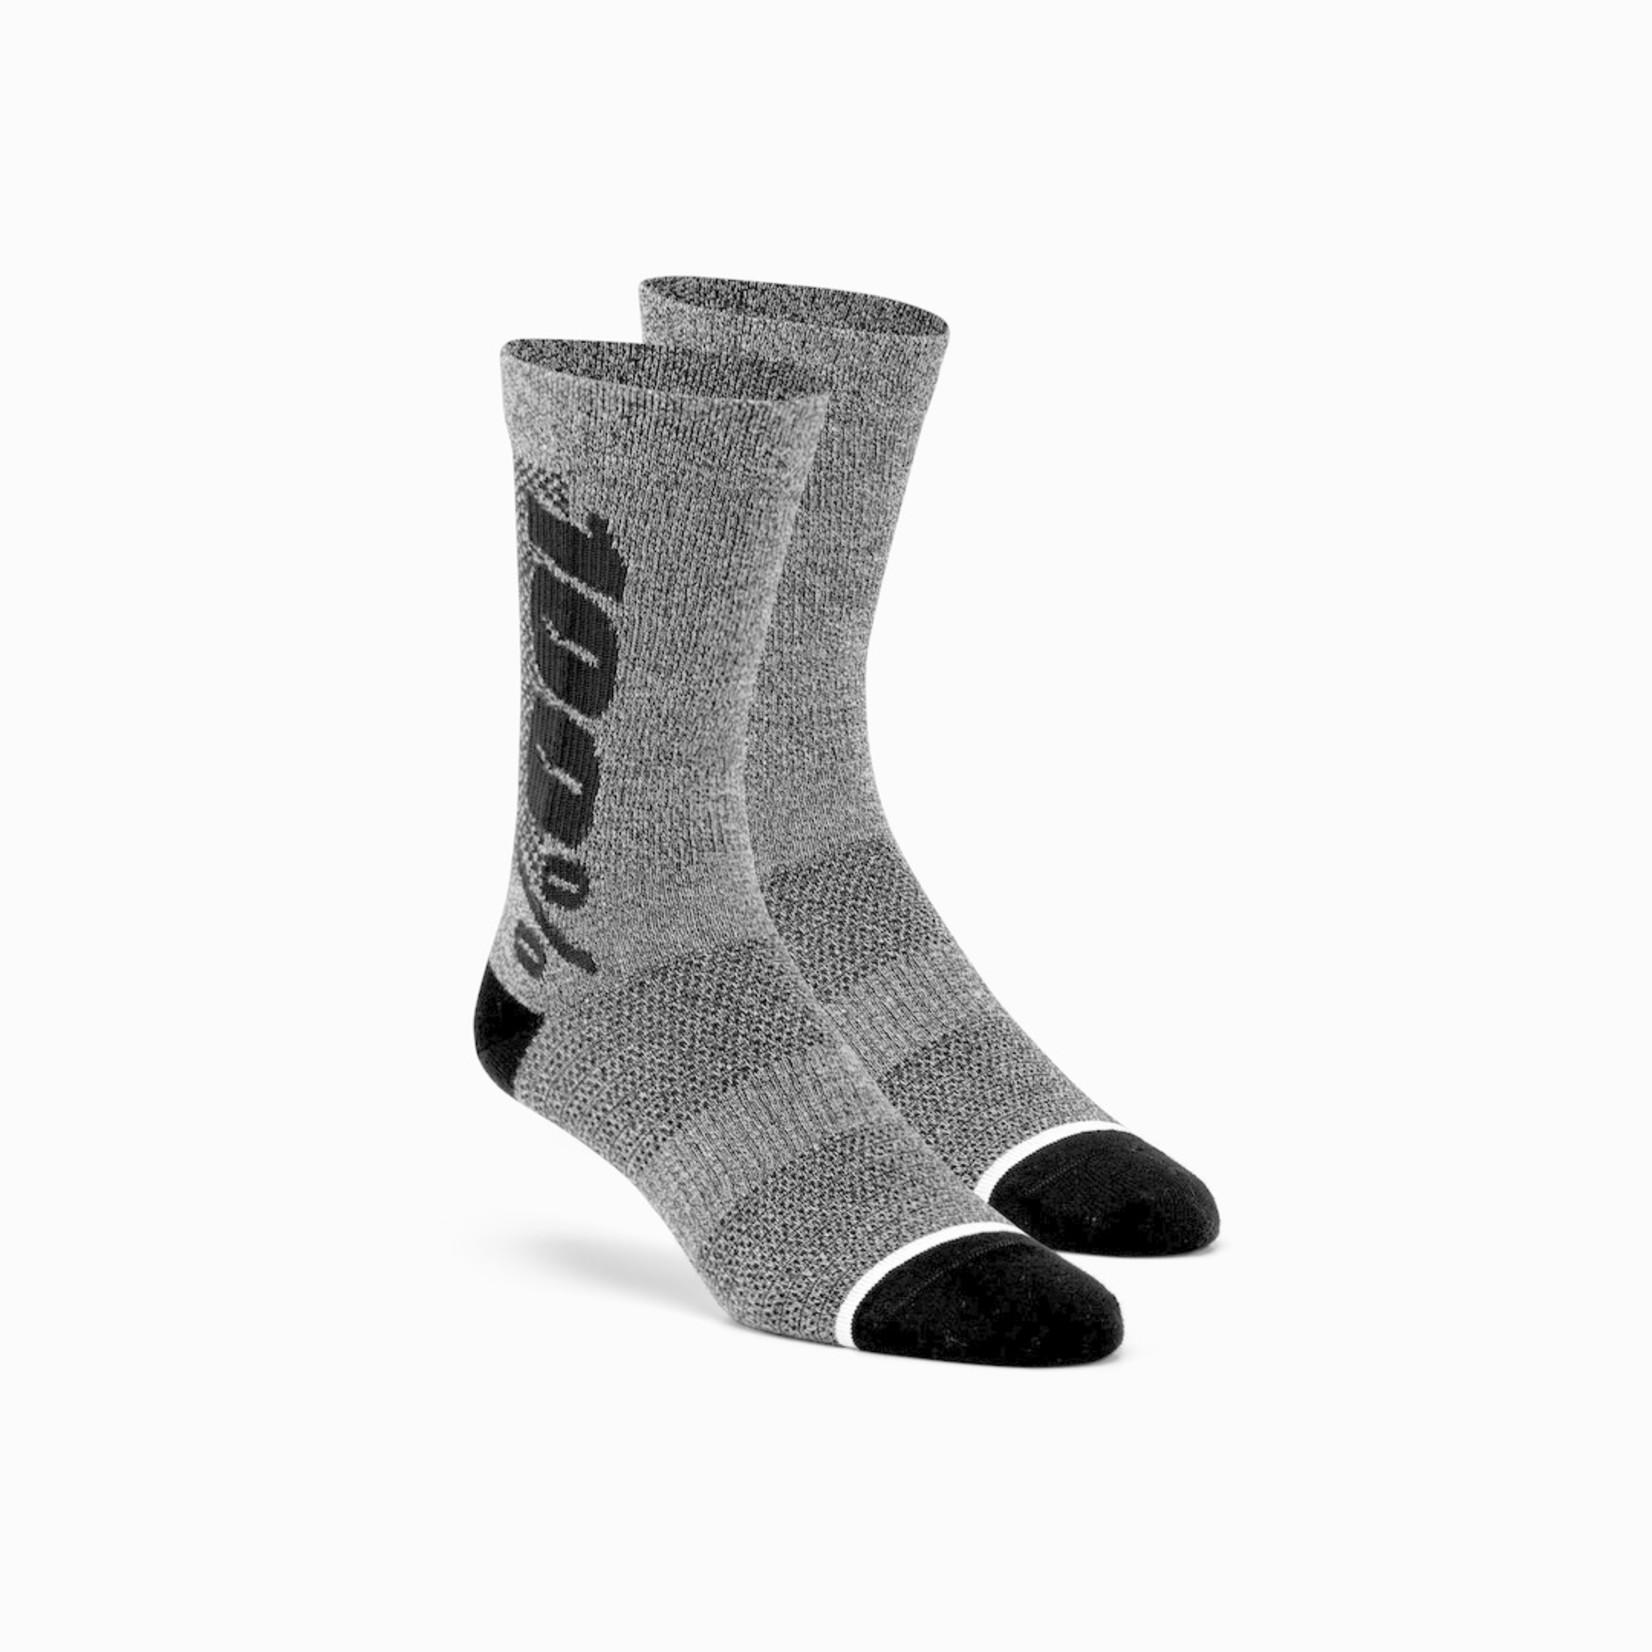 100% 100% Rythm Merino Wool Socks